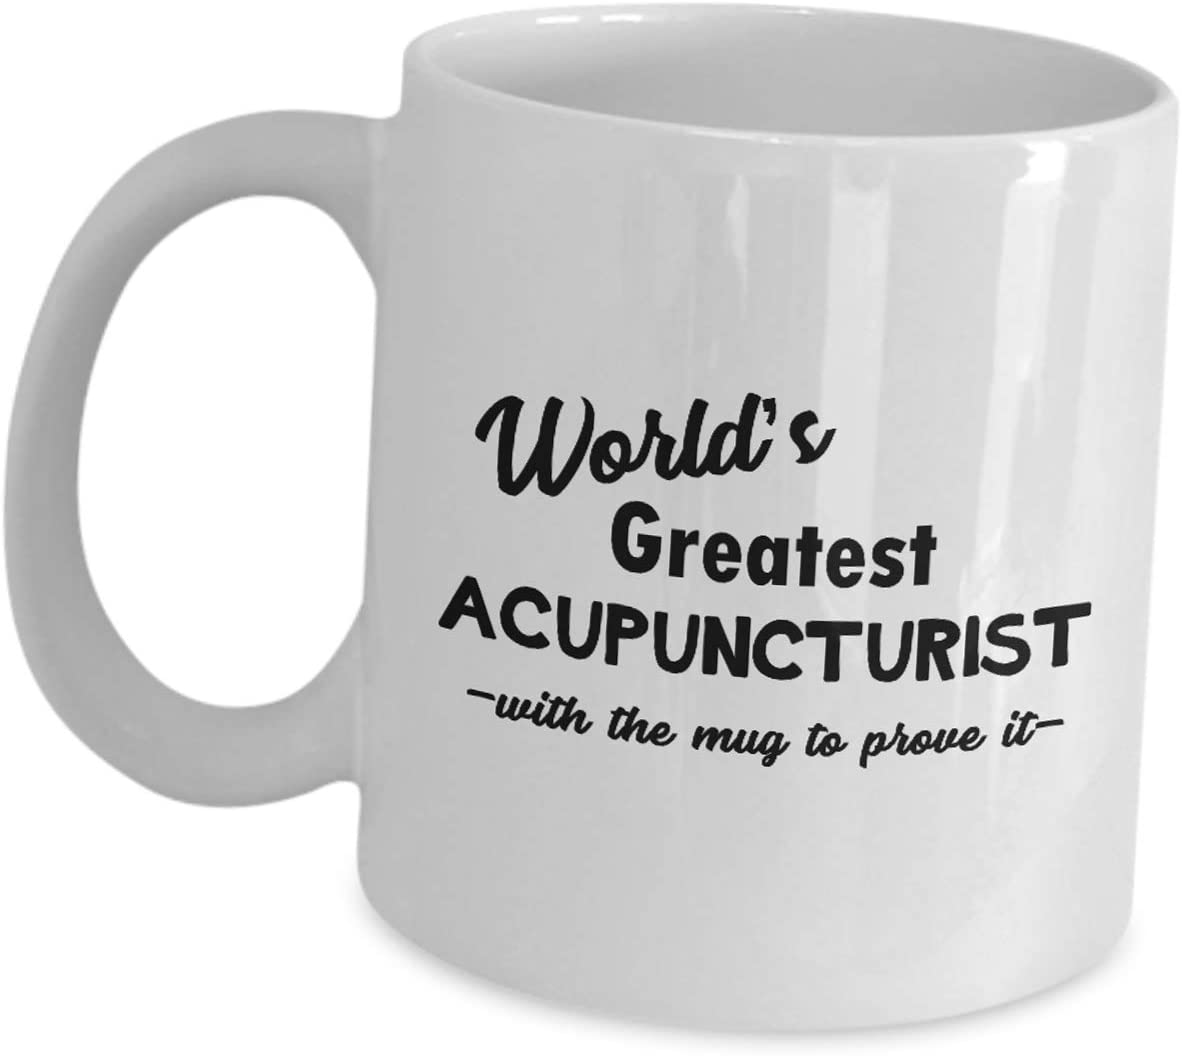 Worlds Greatest Acupuncturist Novelty Gift Mug